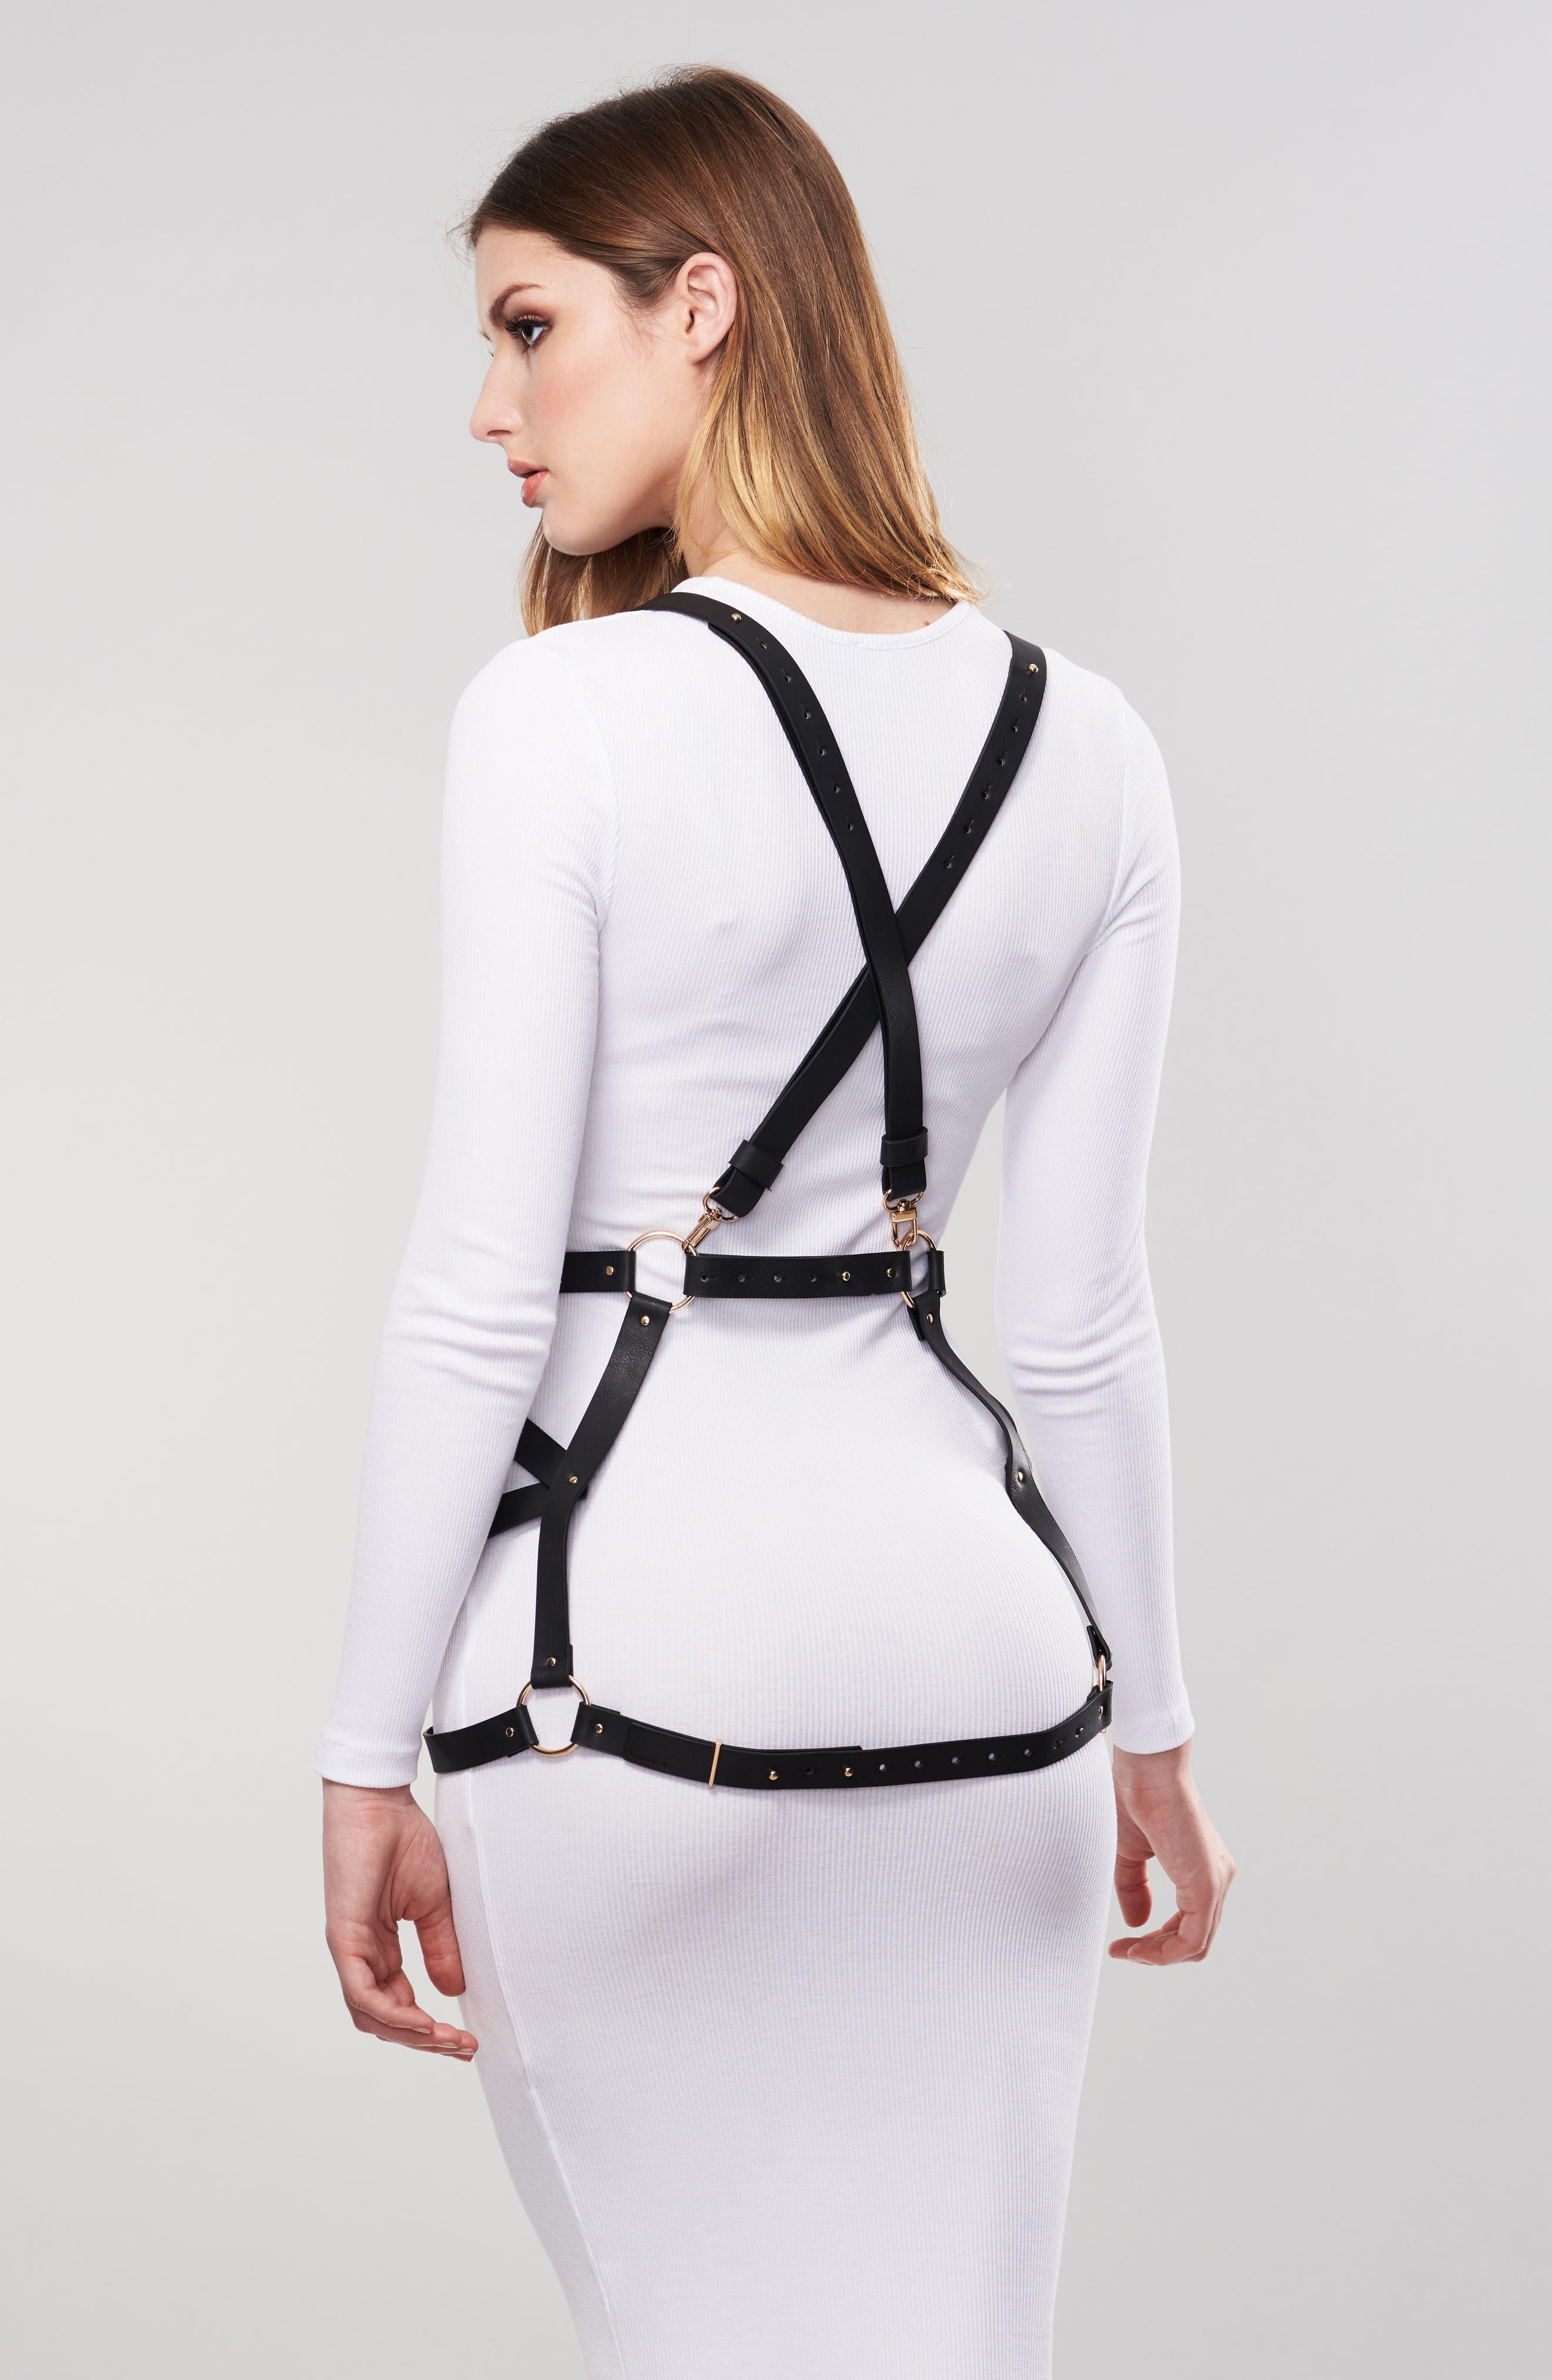 Maze Arrow Dress Harness,                             Alternate thumbnail 4, color,                             001